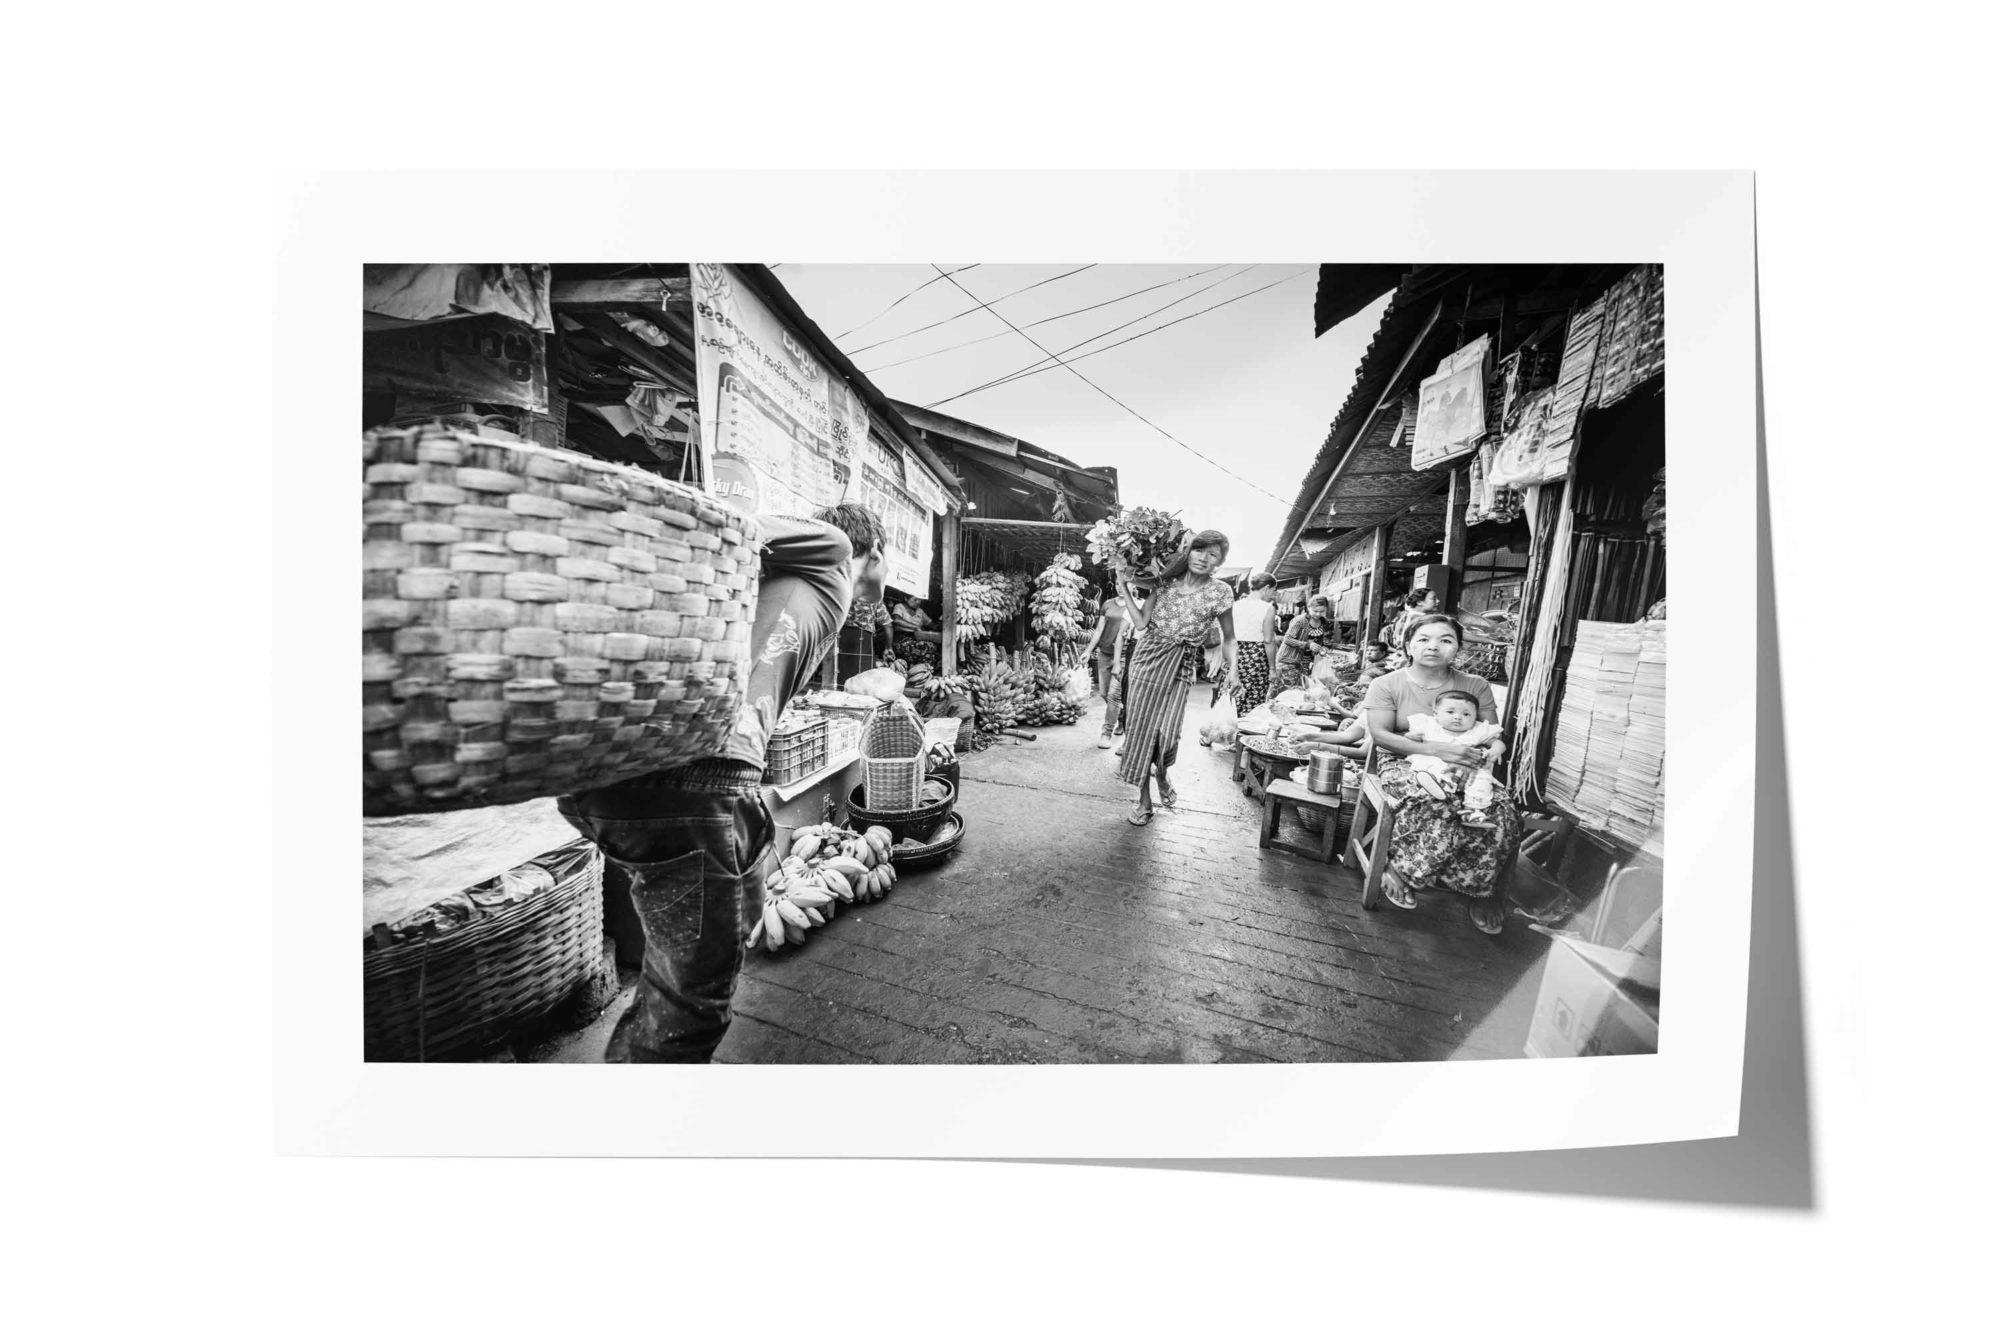 Mani Sithu Market, Nyaung-U, Bagan, Myanmar (Burma)